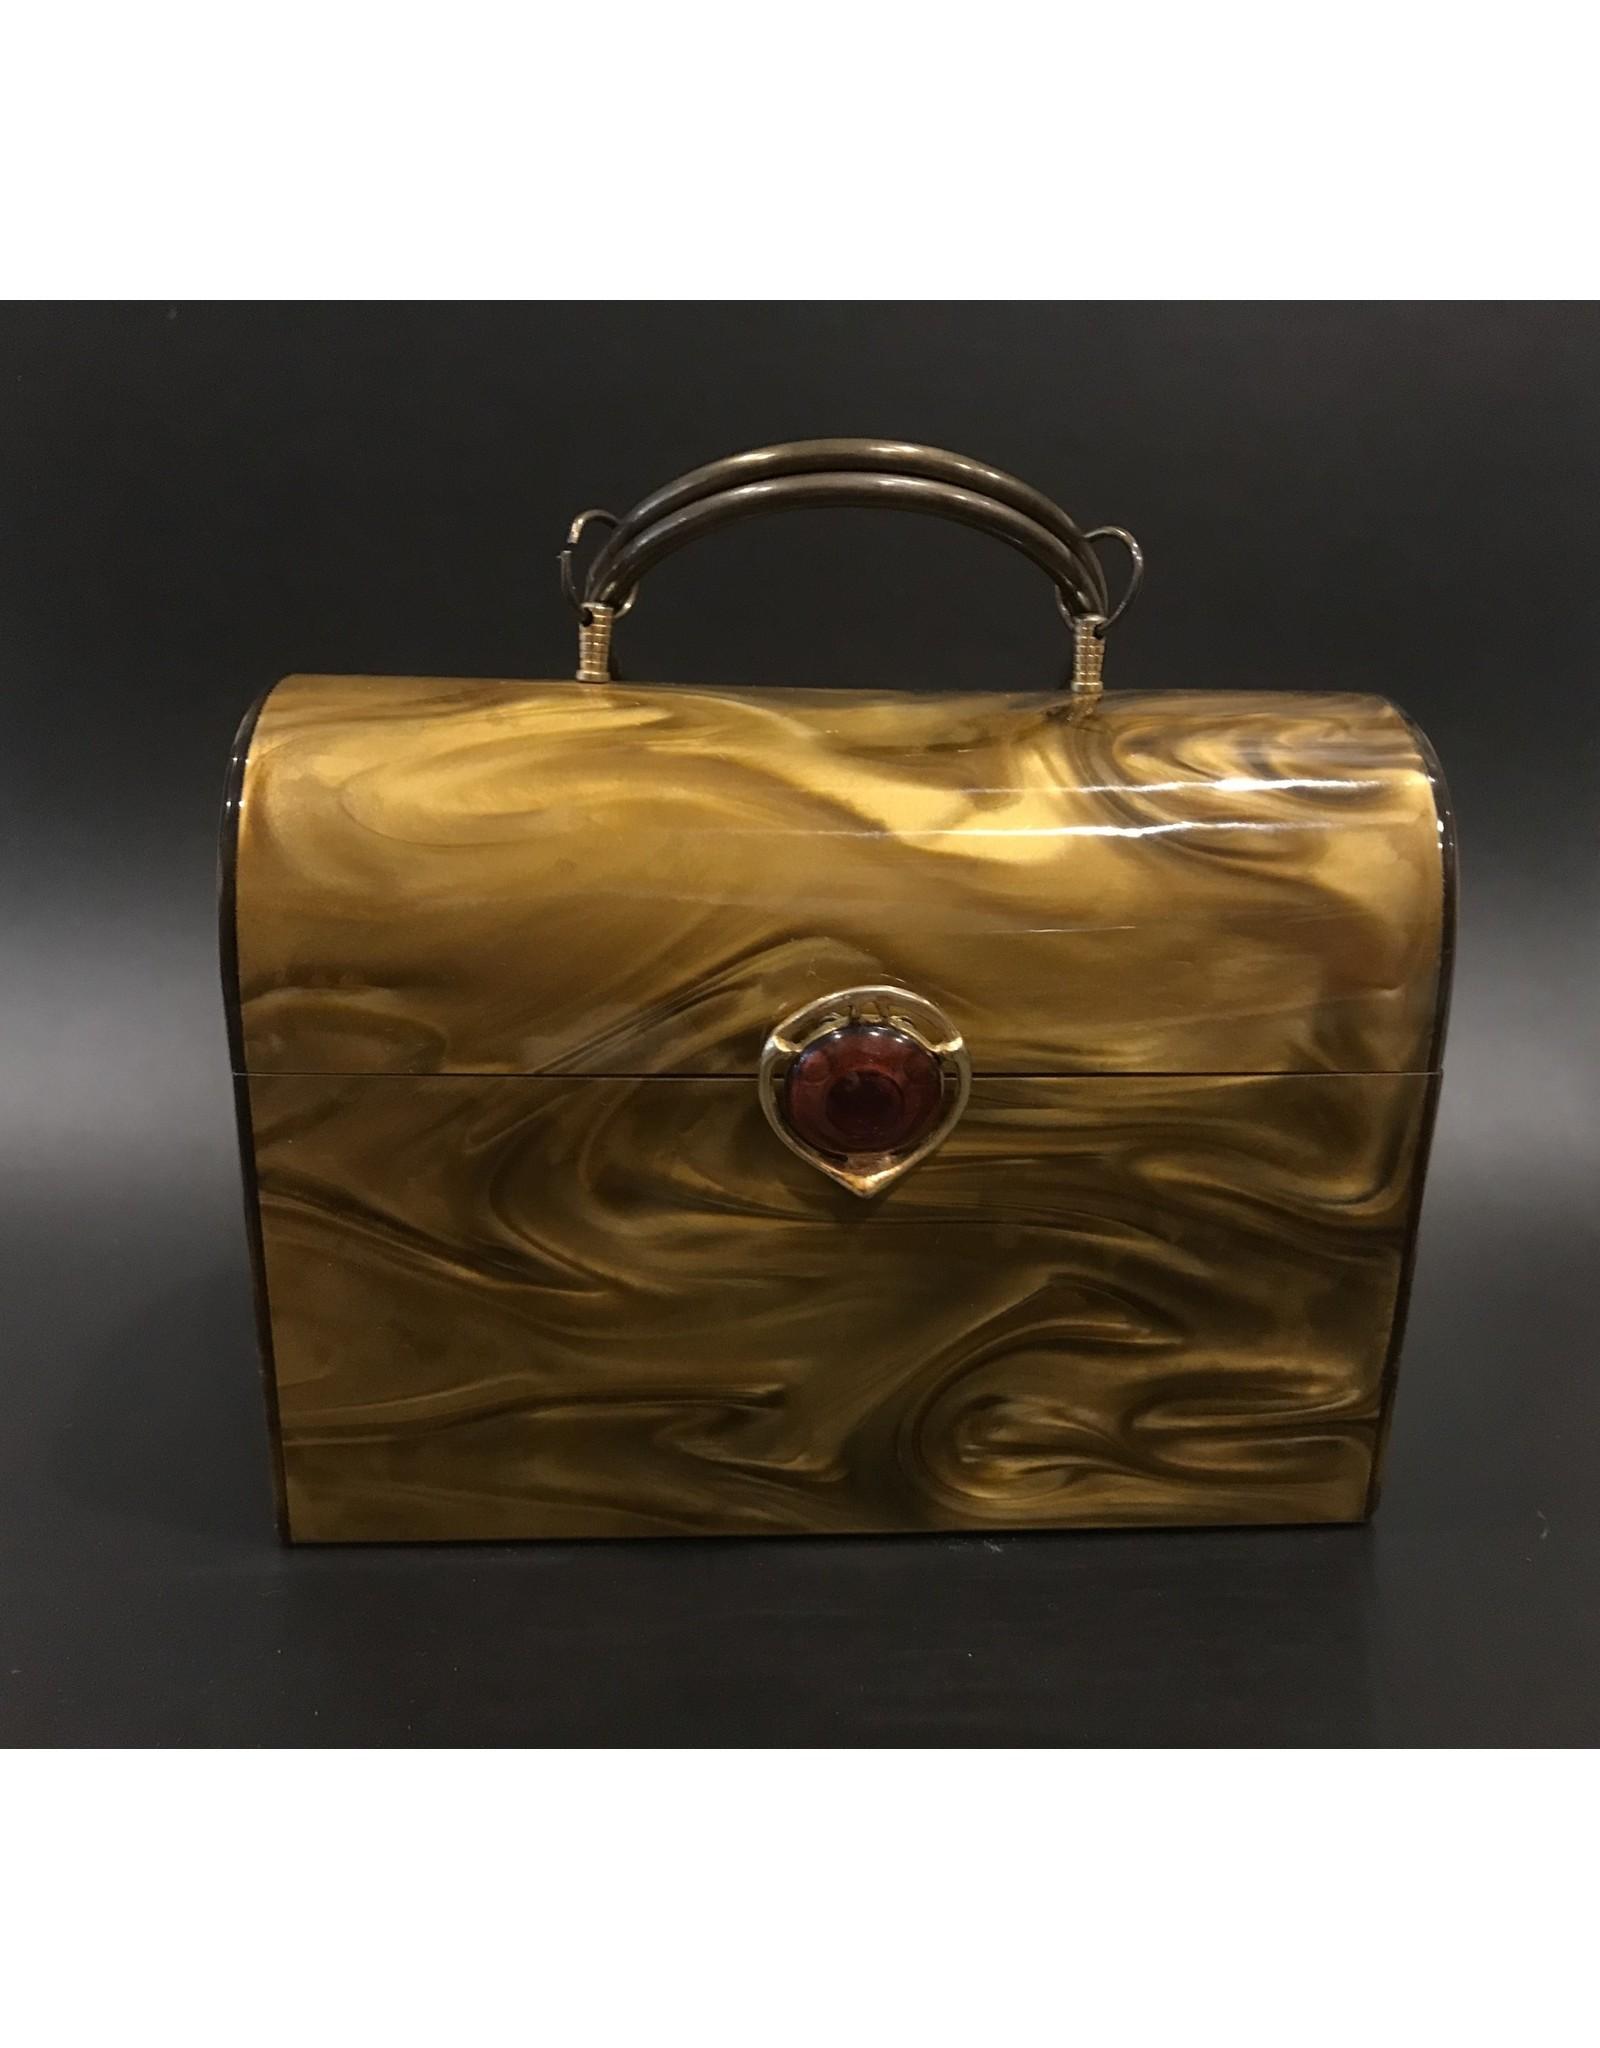 SPV Vintage Lucite Handbag with round Metal Handle